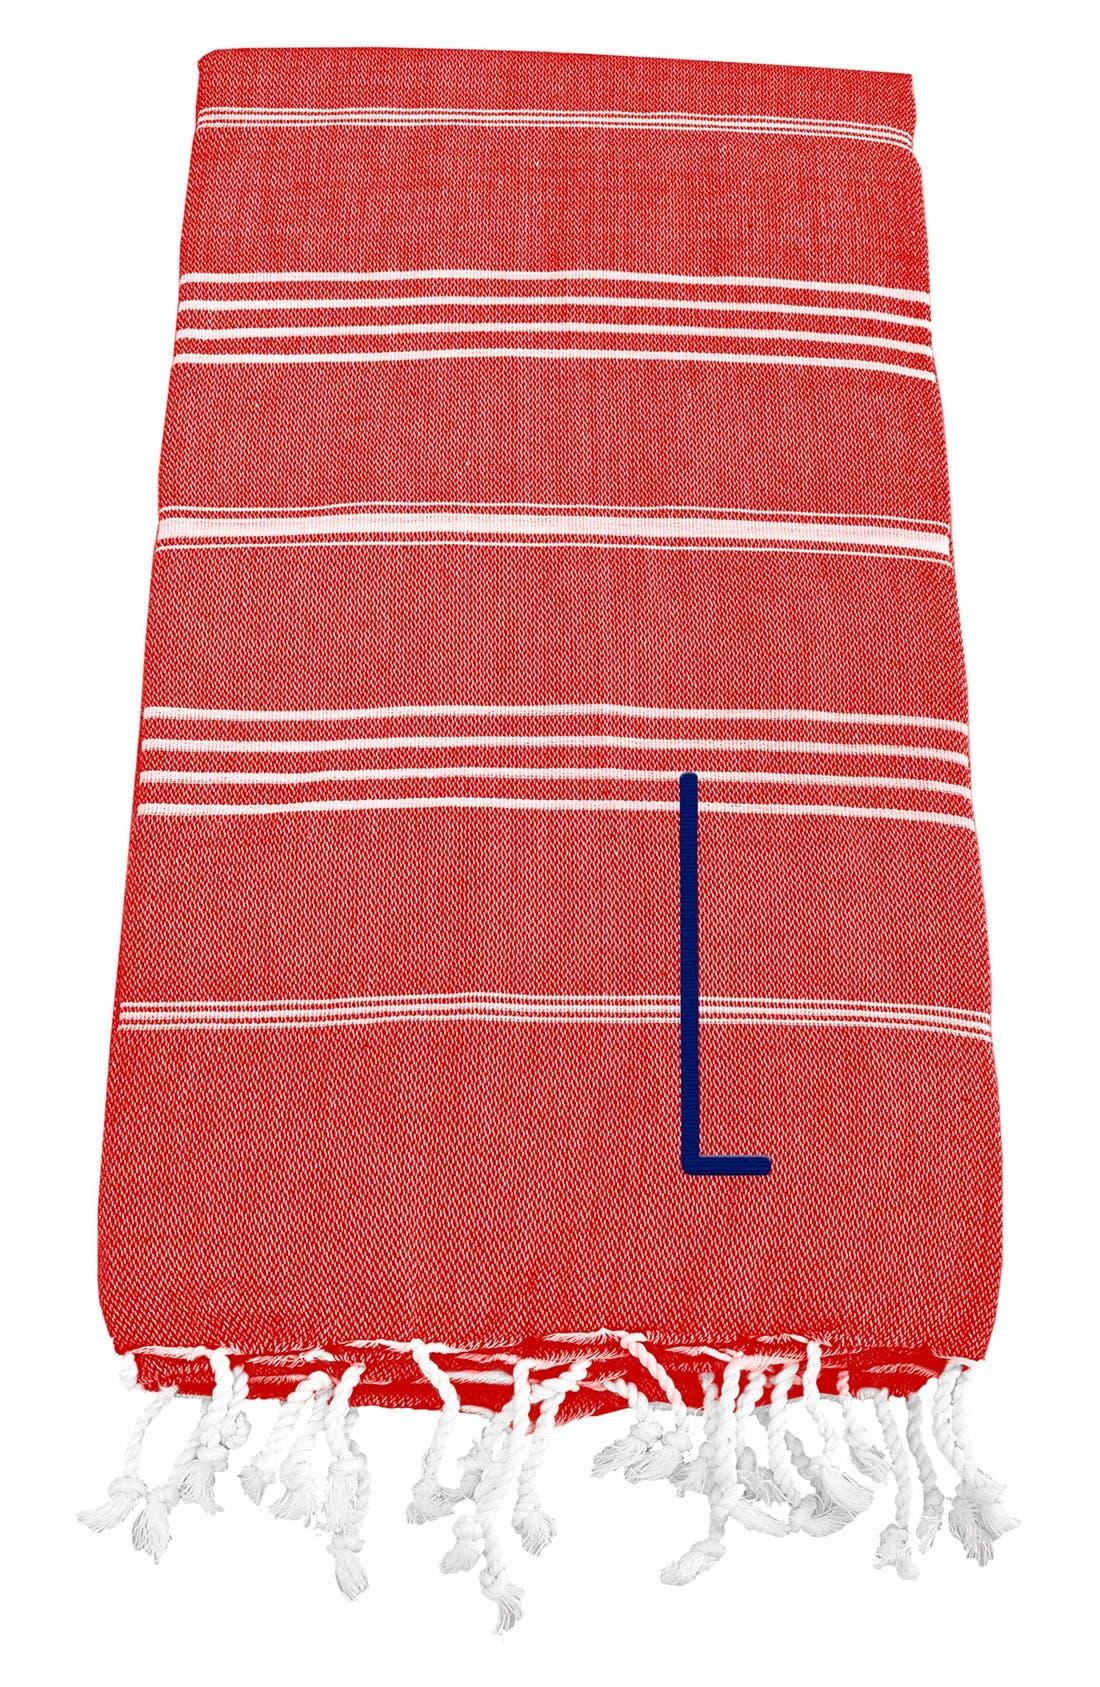 Monogram Turkish Cotton Towel,                         Main,                         color, Red - L